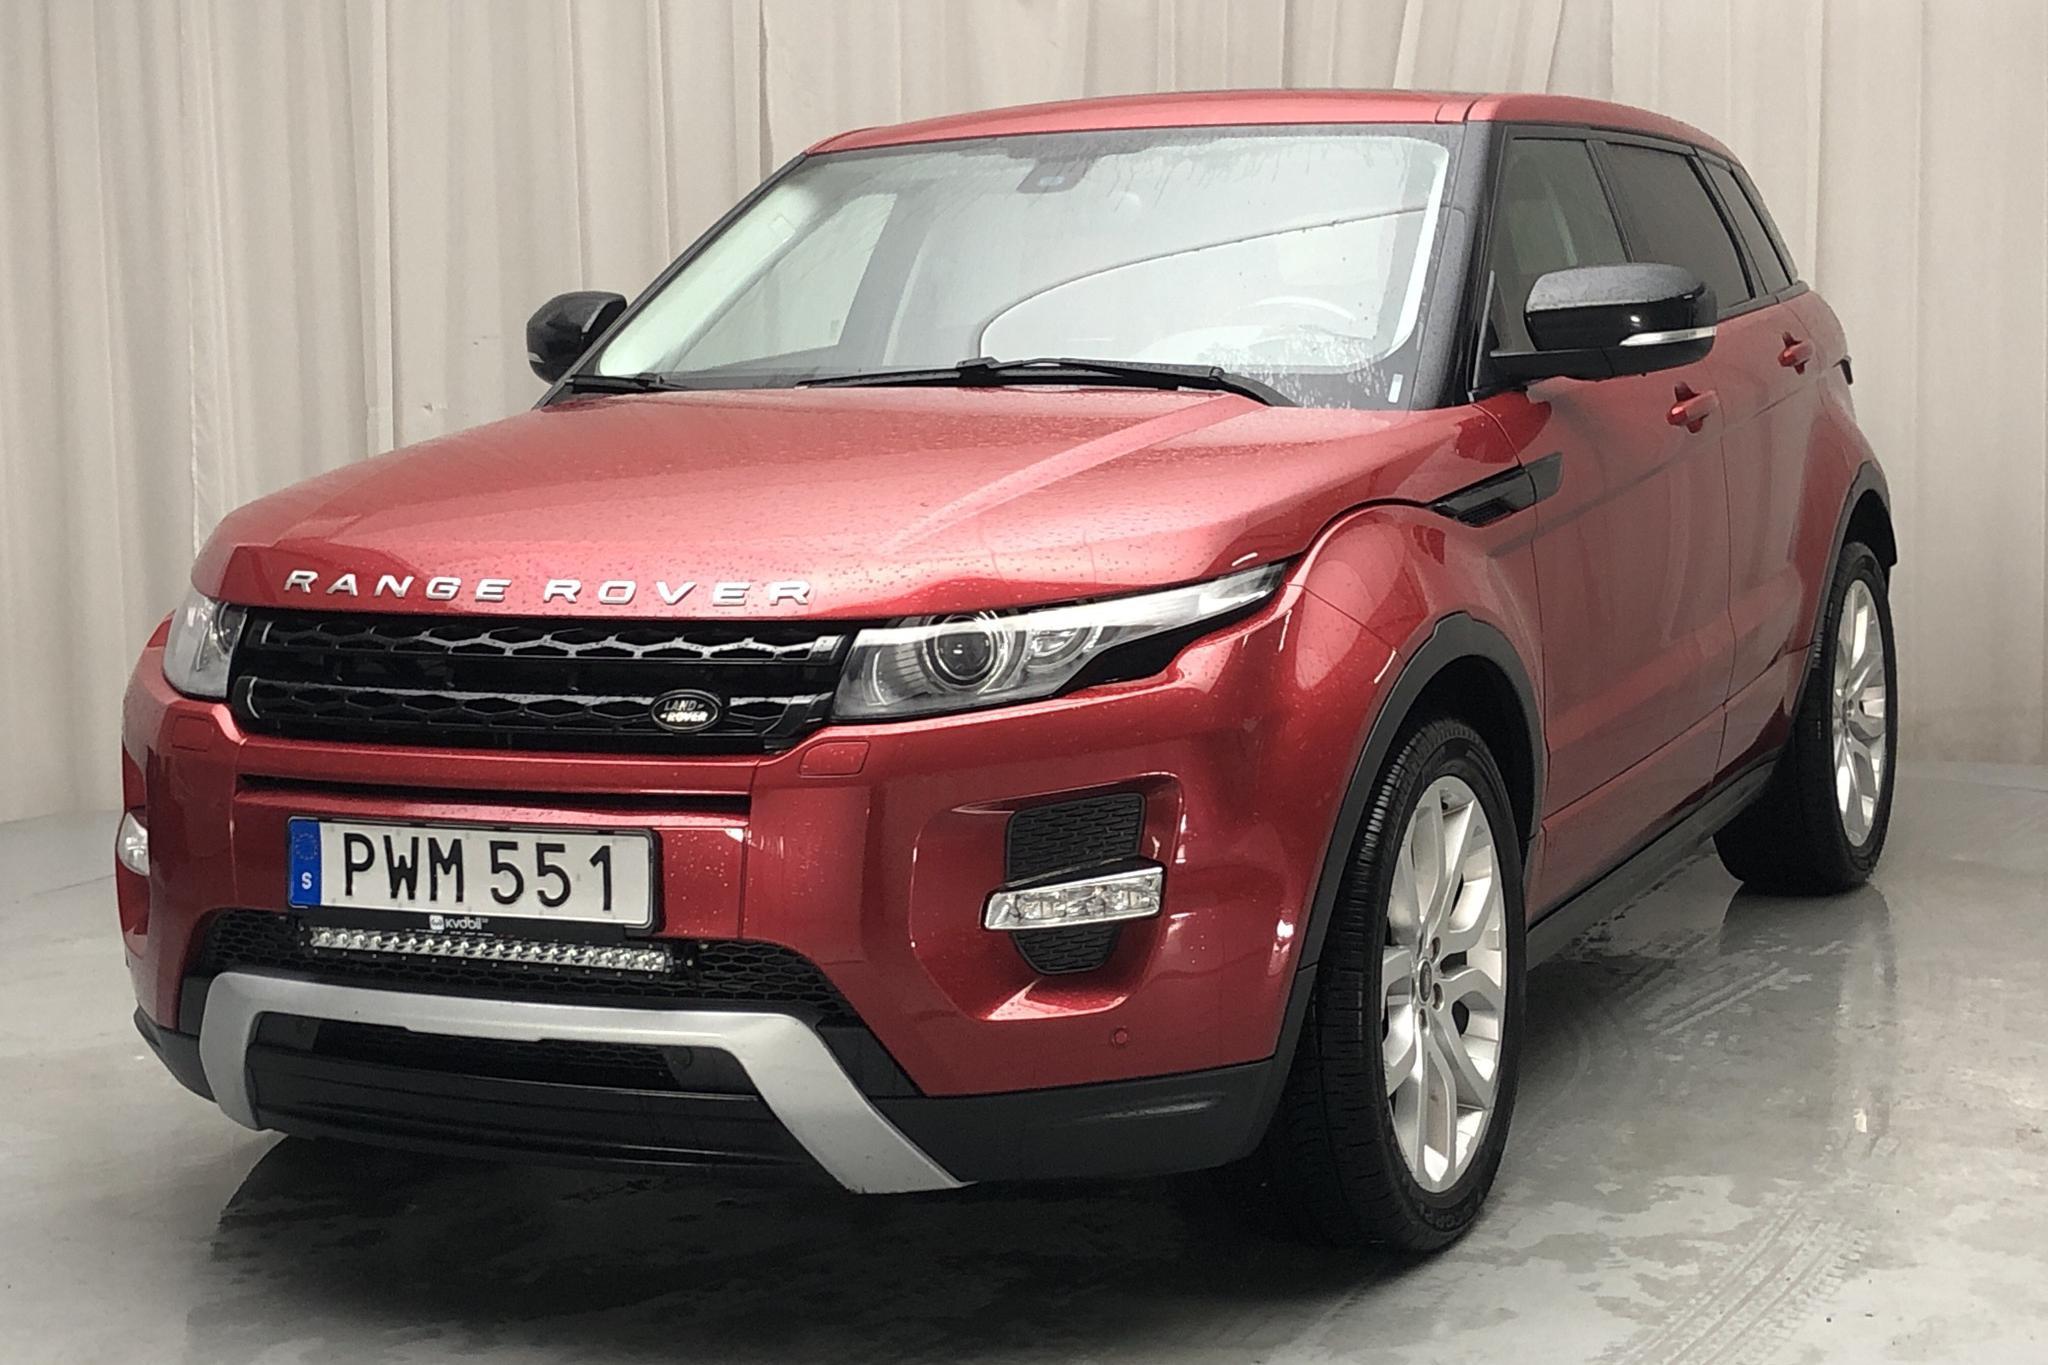 Land Rover Range Rover Evoque 2.2 SD4 5dr (190hk) - 14 087 mil - Automat - röd - 2013